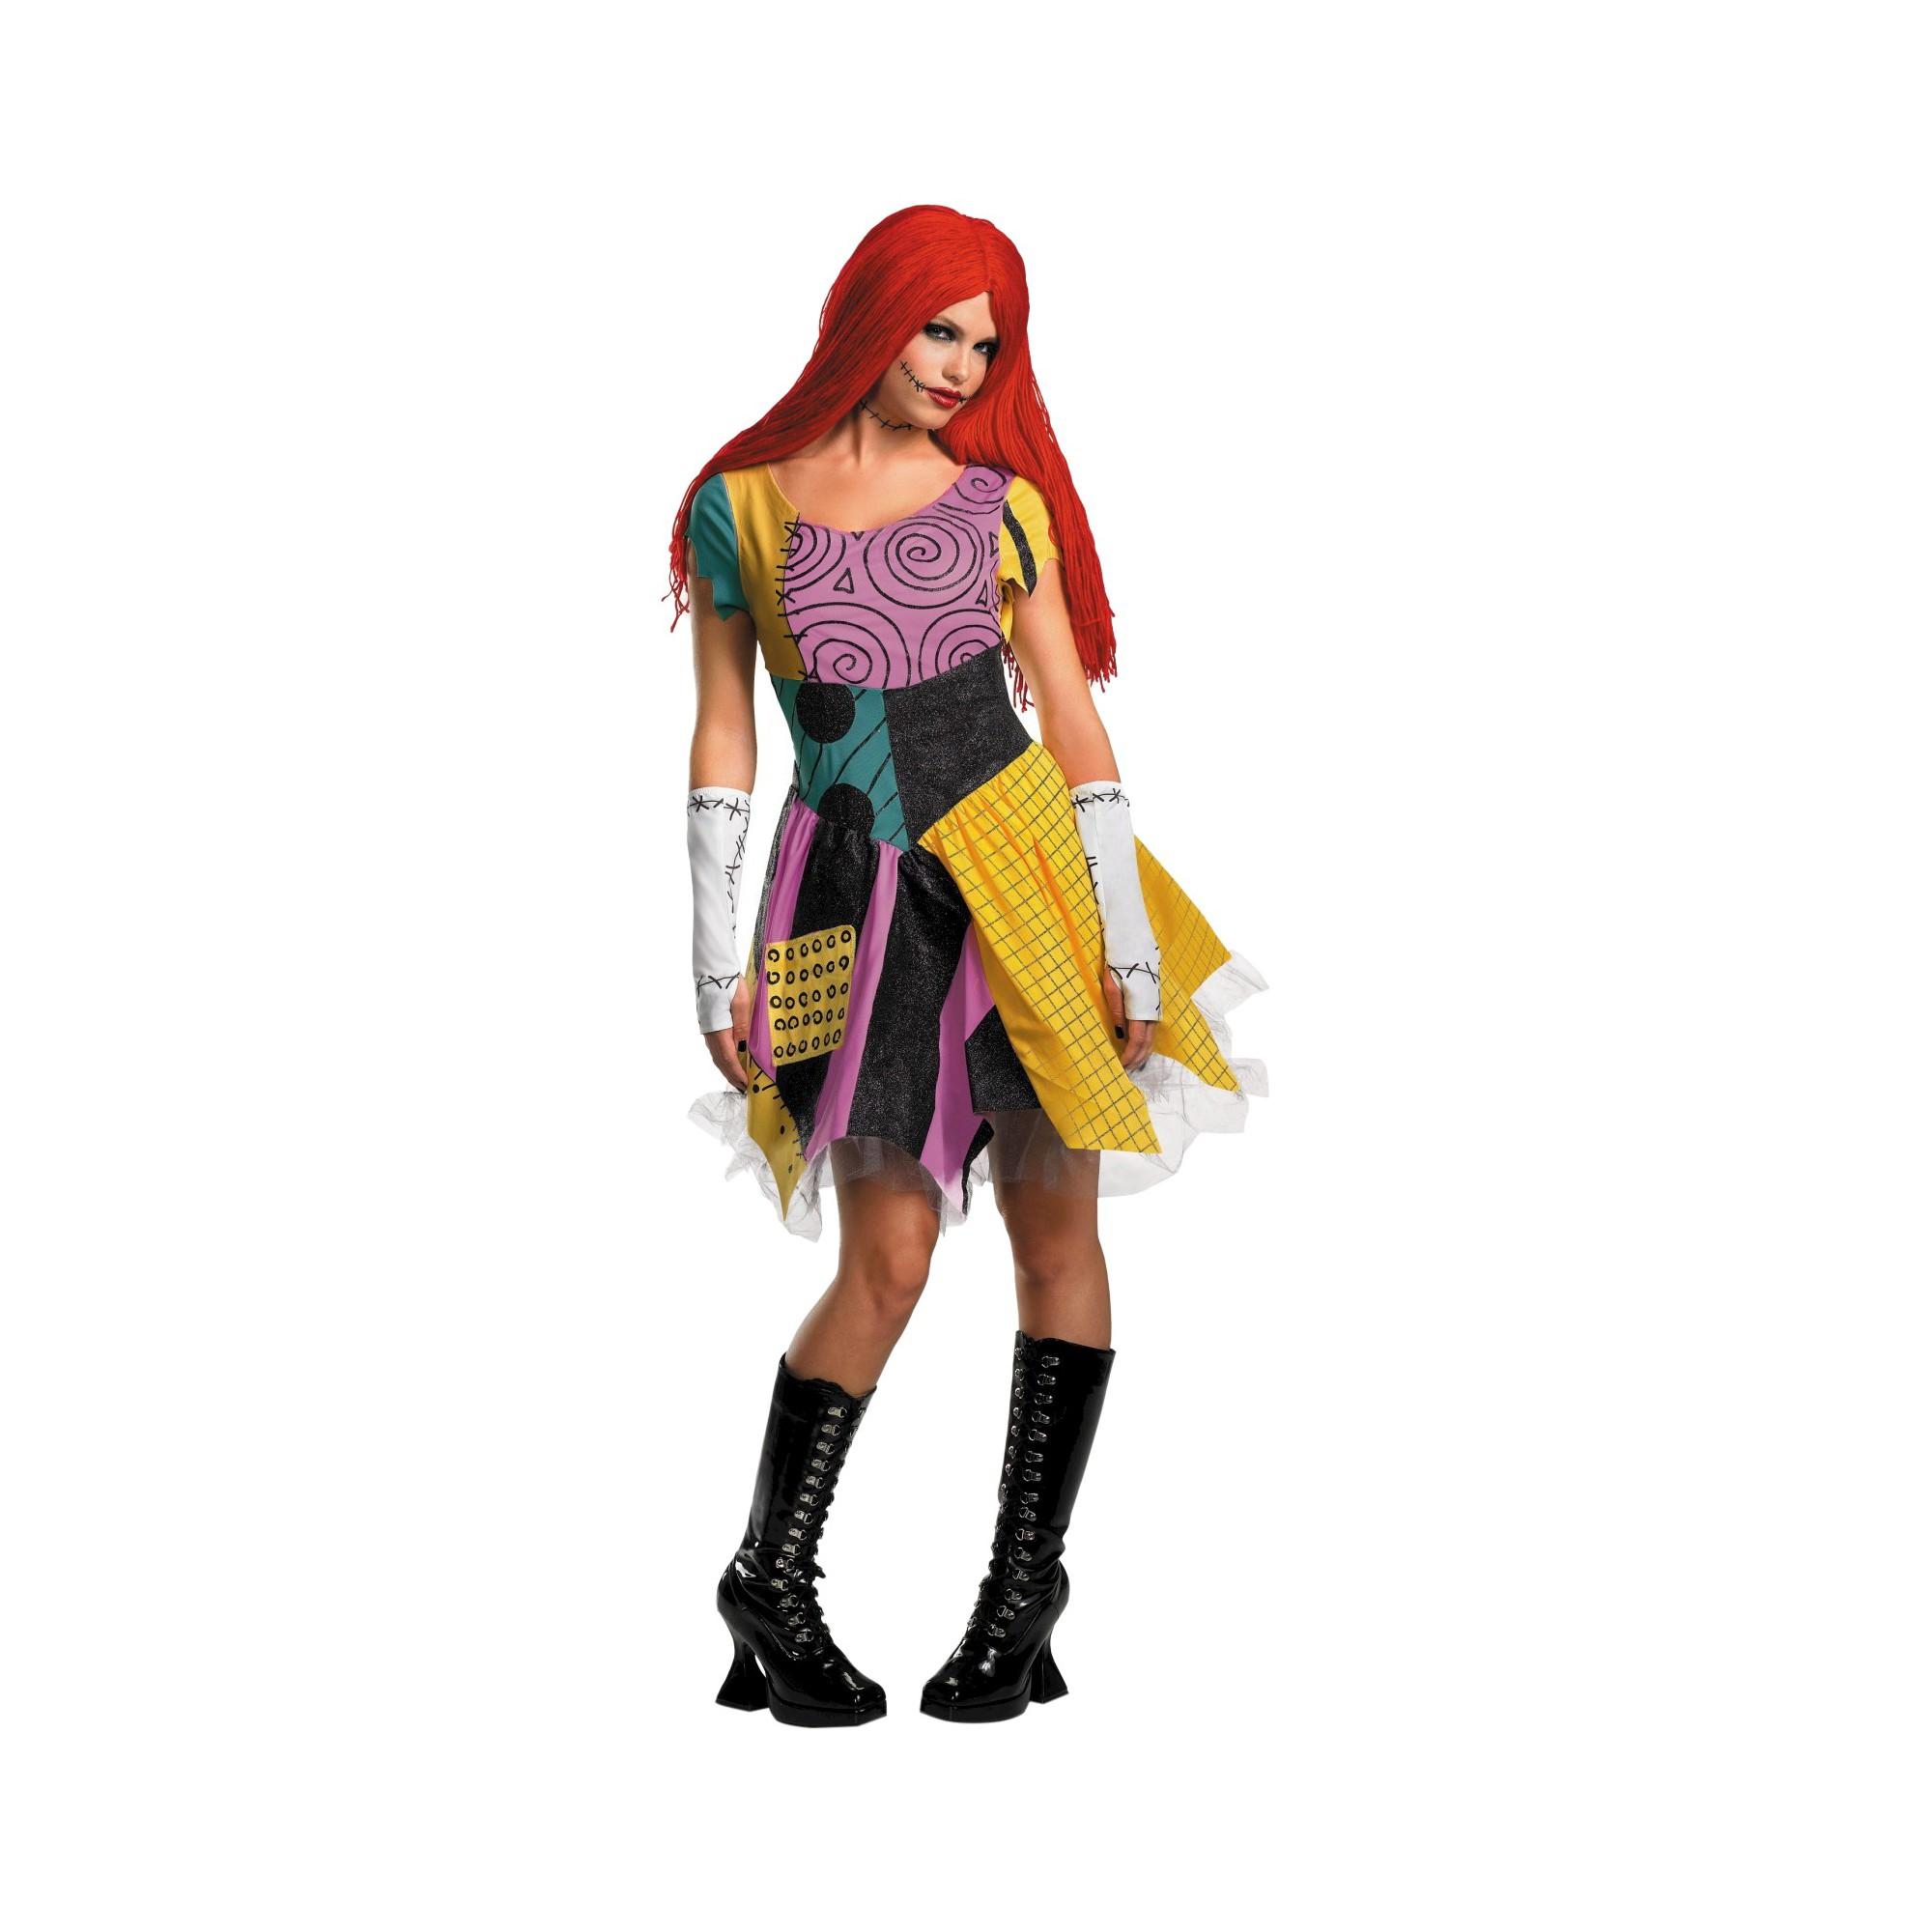 932c14d615ec Halloween Women s The Nightmare Before Christmas Sally Costume ...